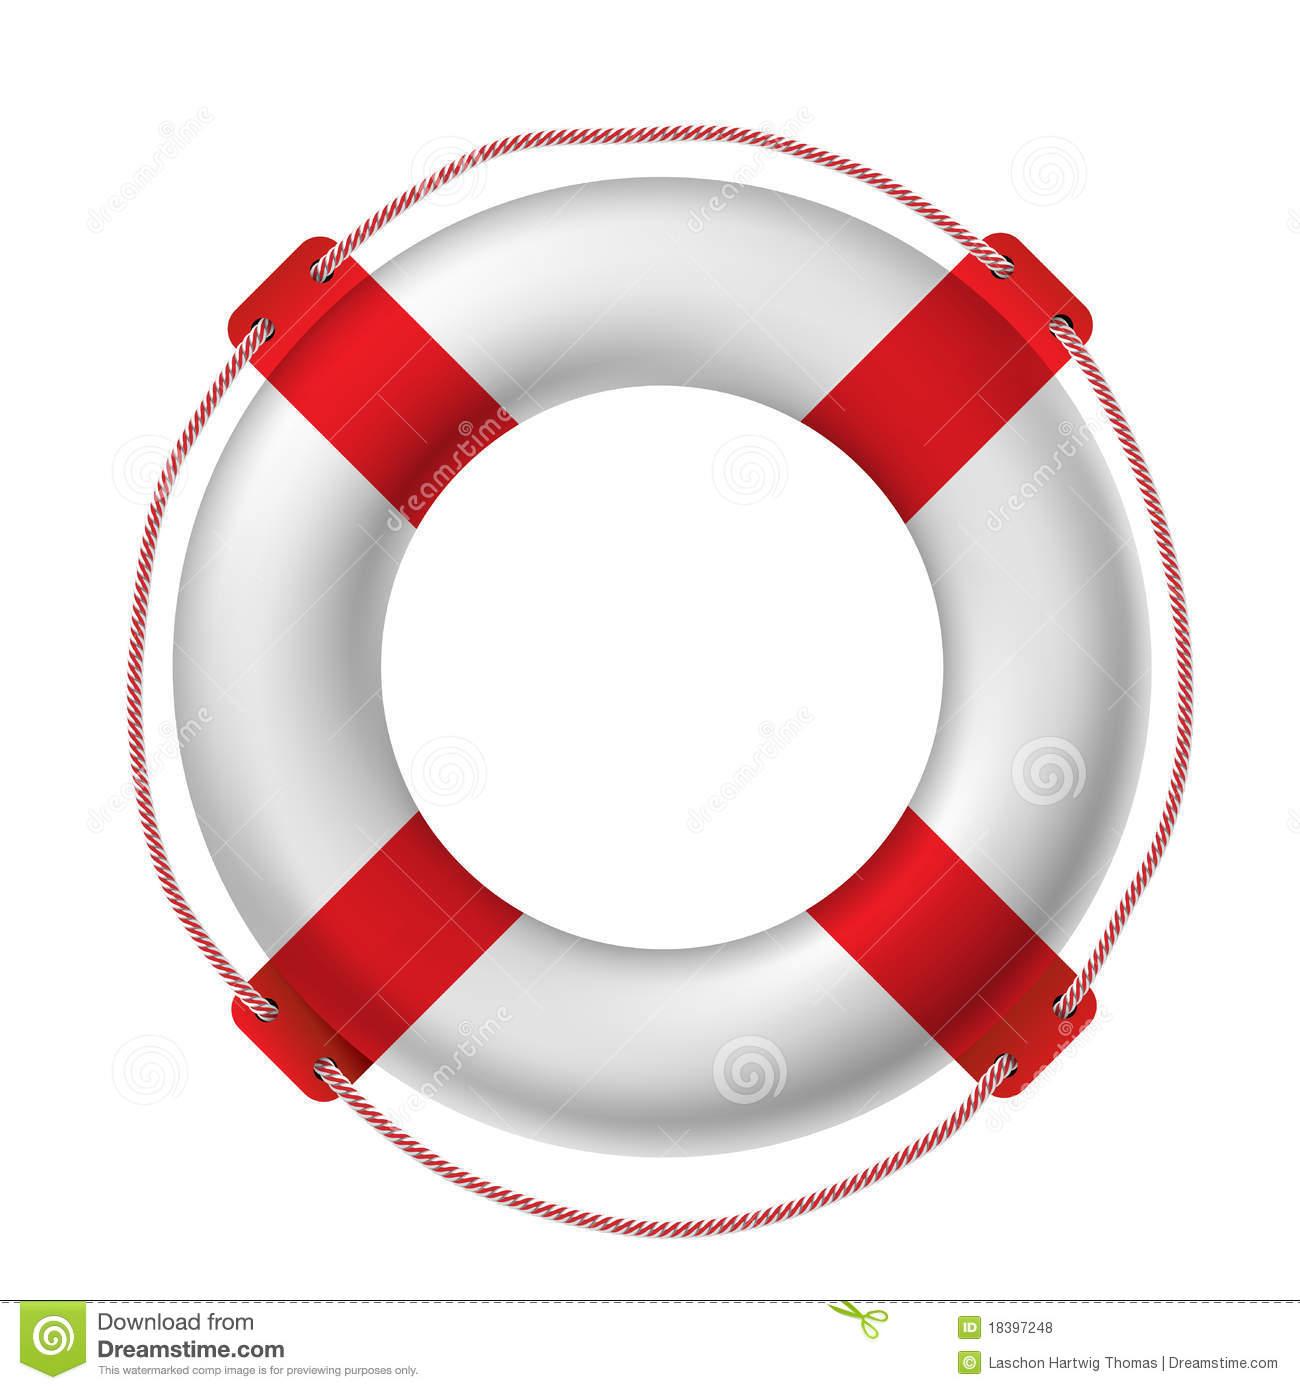 Lifeguard buoy clipart image transparent Lifeguard Symbol Clipart | Free download best Lifeguard Symbol ... image transparent